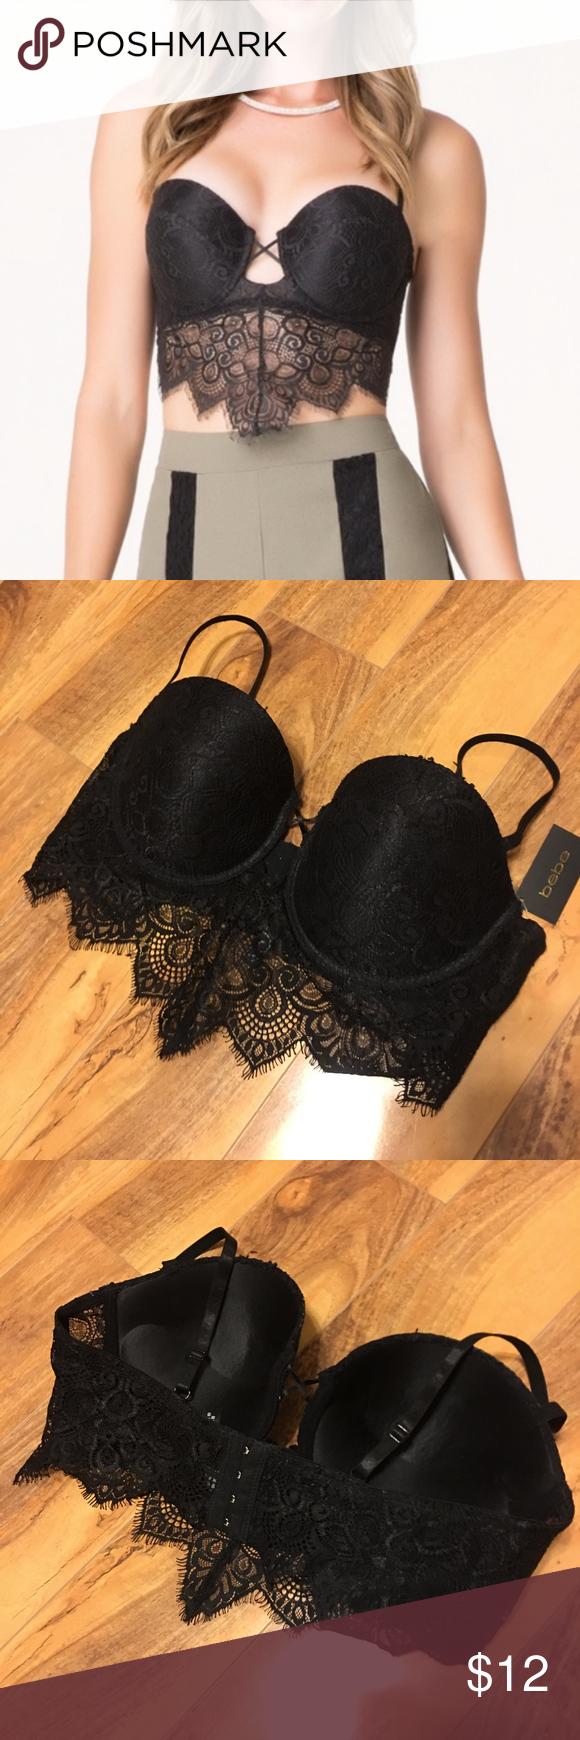 318ce08c06689 bebe Black Lace Bralette Size L Delicate